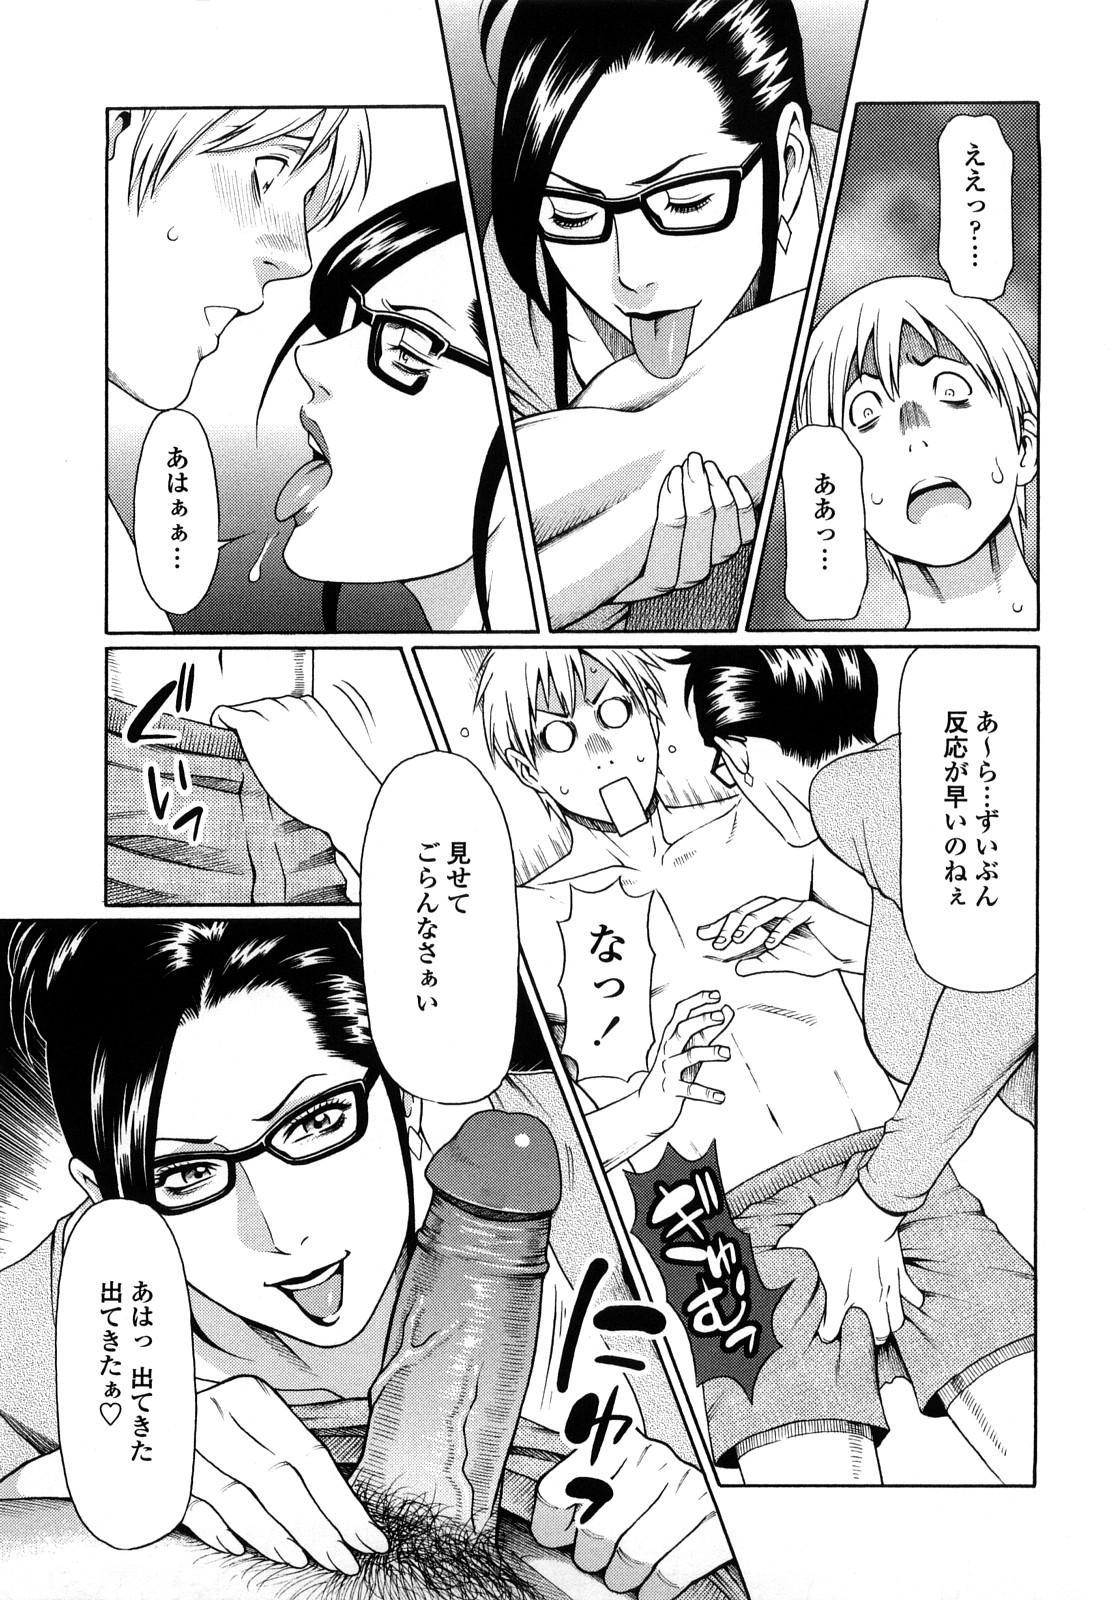 [Takasugi Kou] Kindan no Haha-Ana - Immorality Love-Hole [Decensored] 160